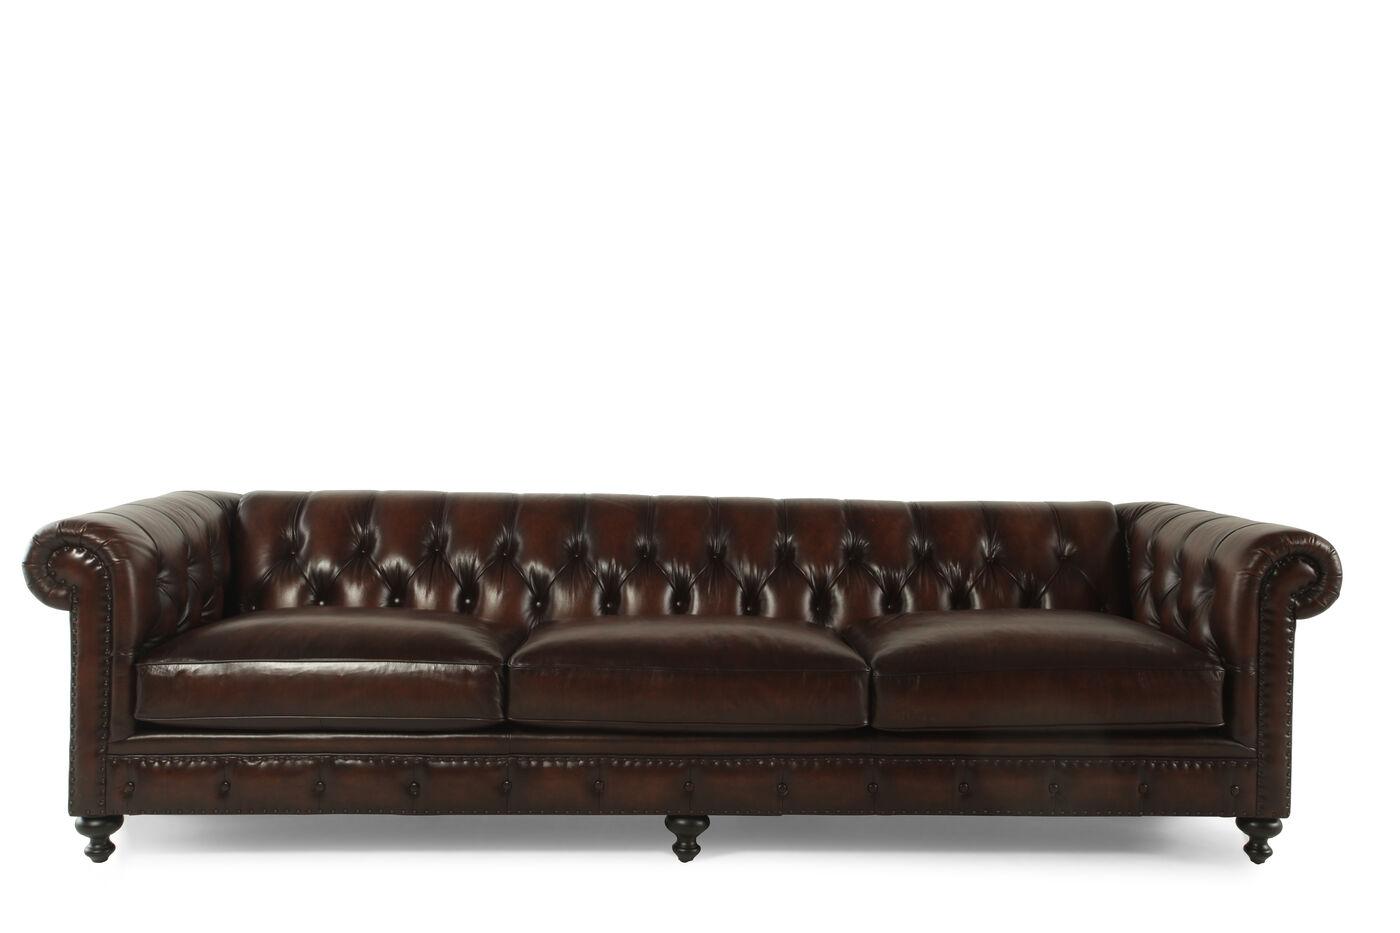 Bernhardt London Club Leather Sofa